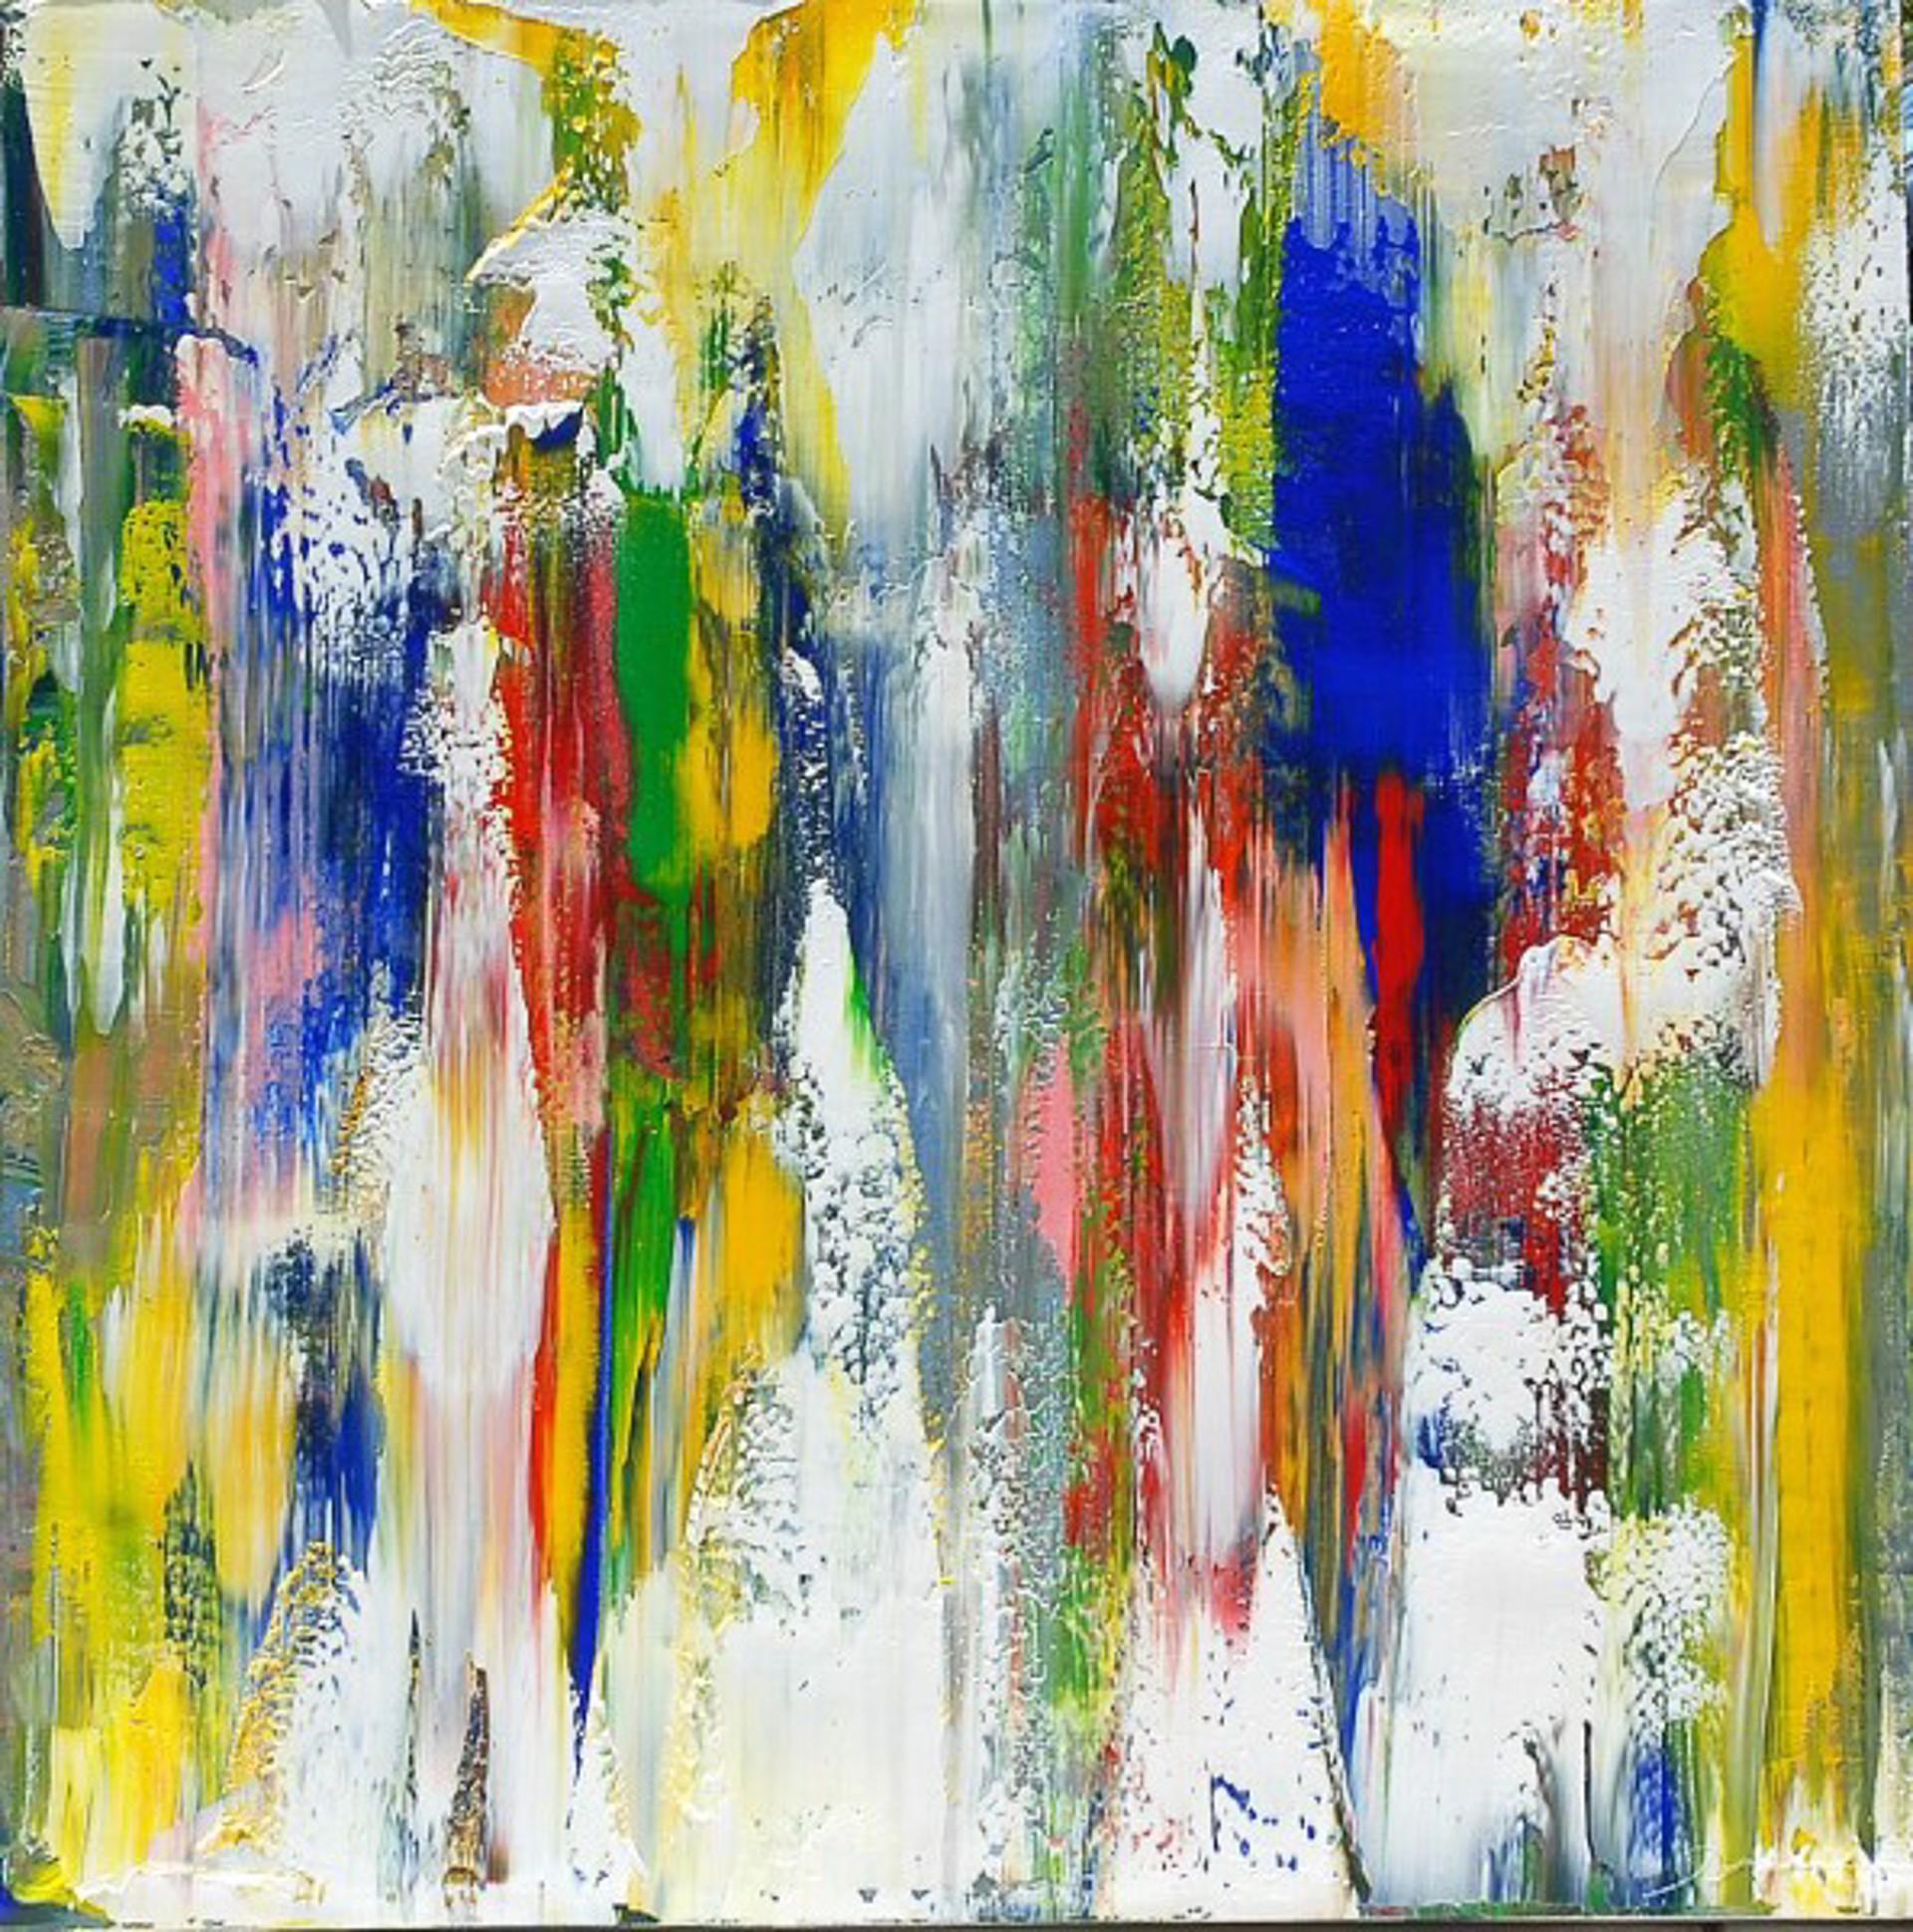 Colors Speak by James C. Leonard